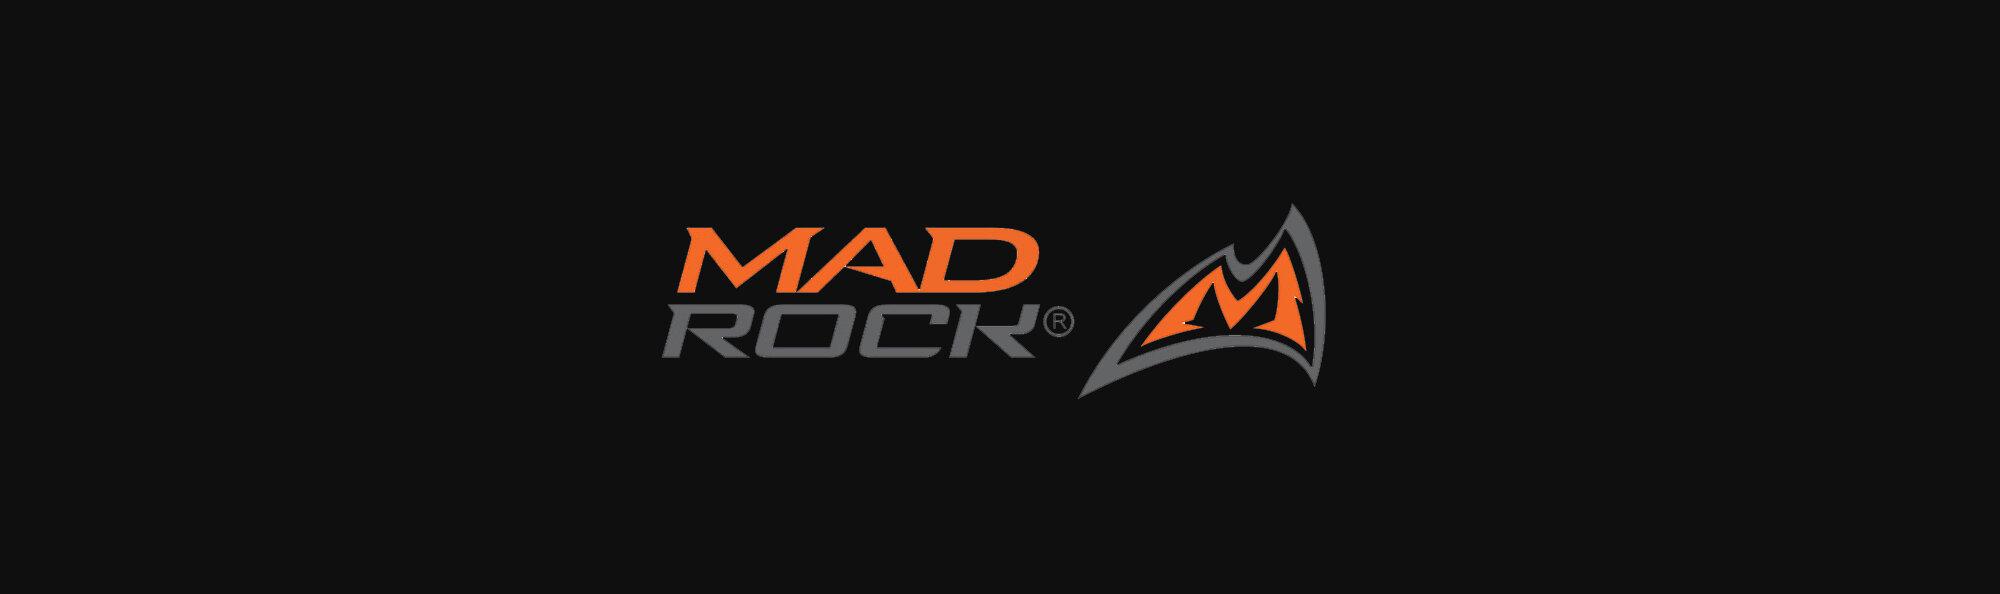 Mad Rock Sponsor Logo 2.jpg